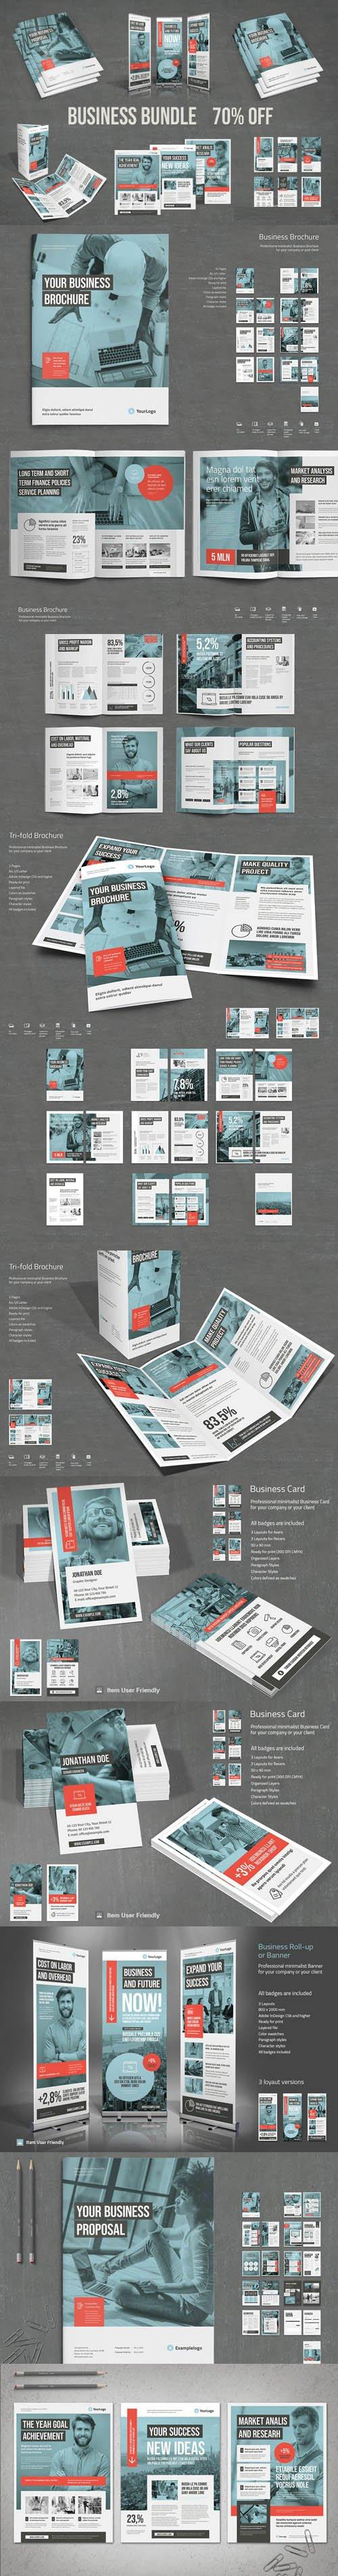 CreativeMarket - Business Bundle Vol.2 - Indesign INDD Templates